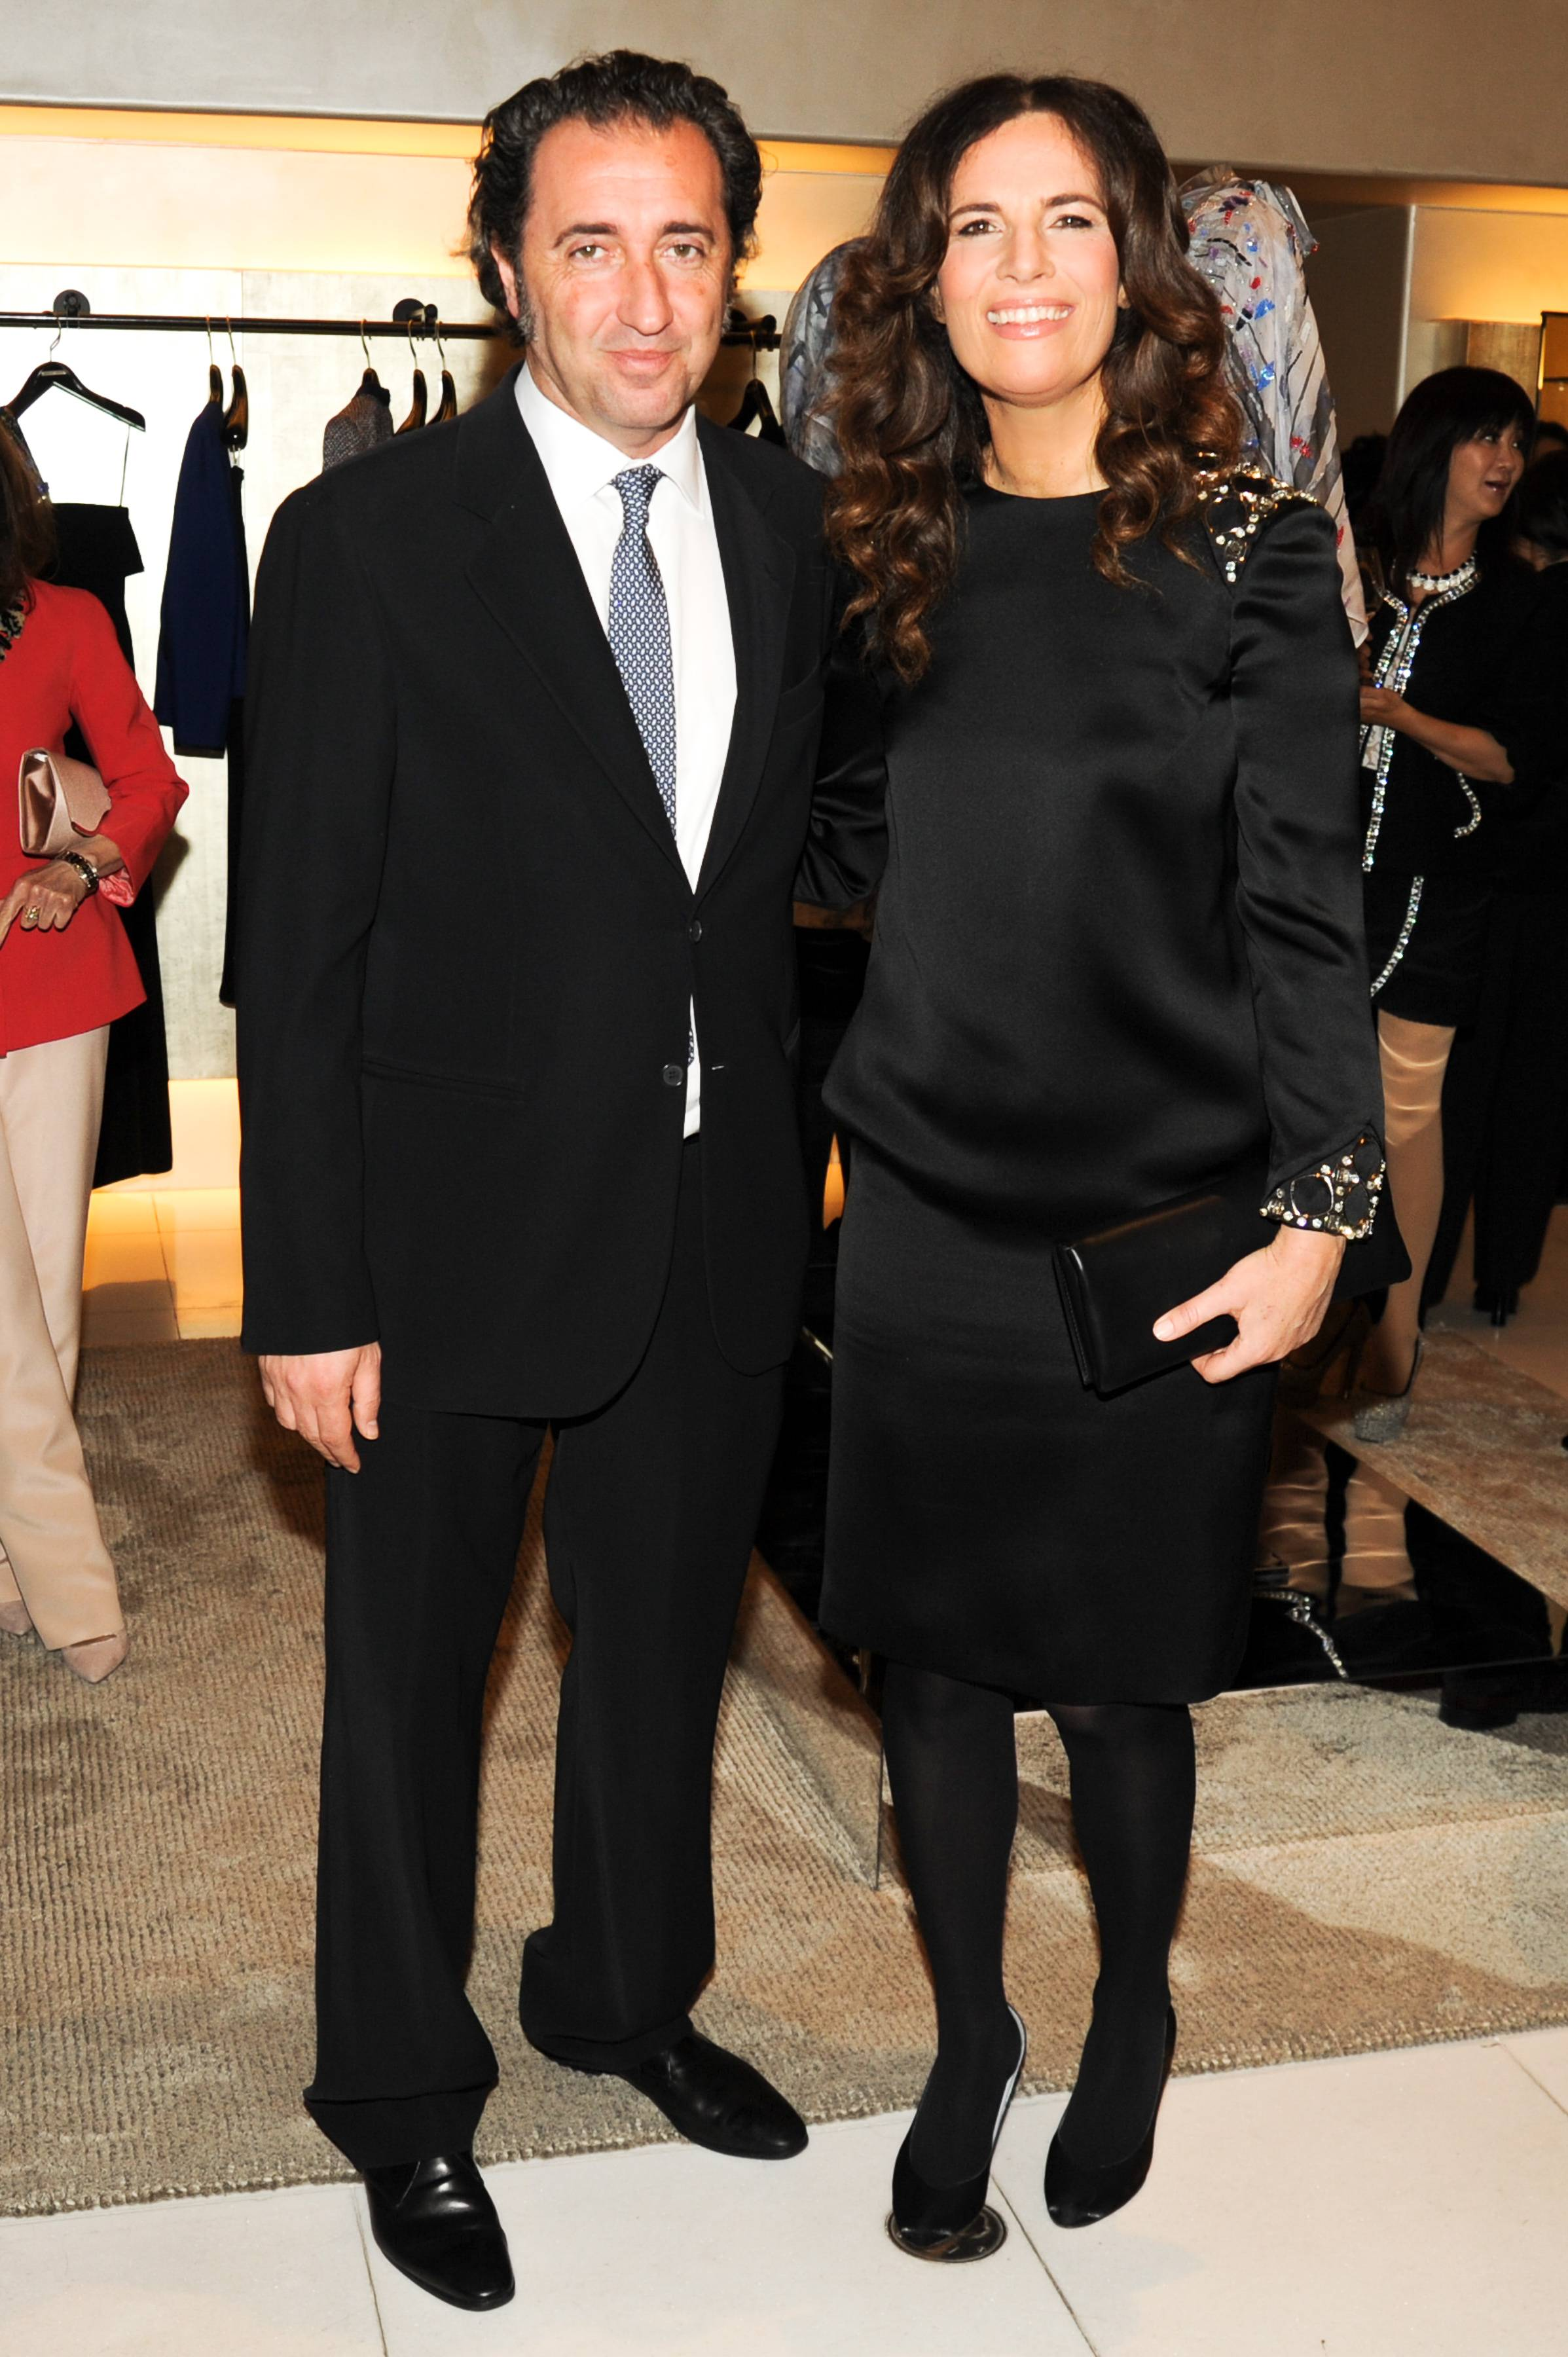 GIORGIO ARMANI Celebrates the 86th Annual Academy Award Nominations for Martin Scorsese and Paolo Sorrentino